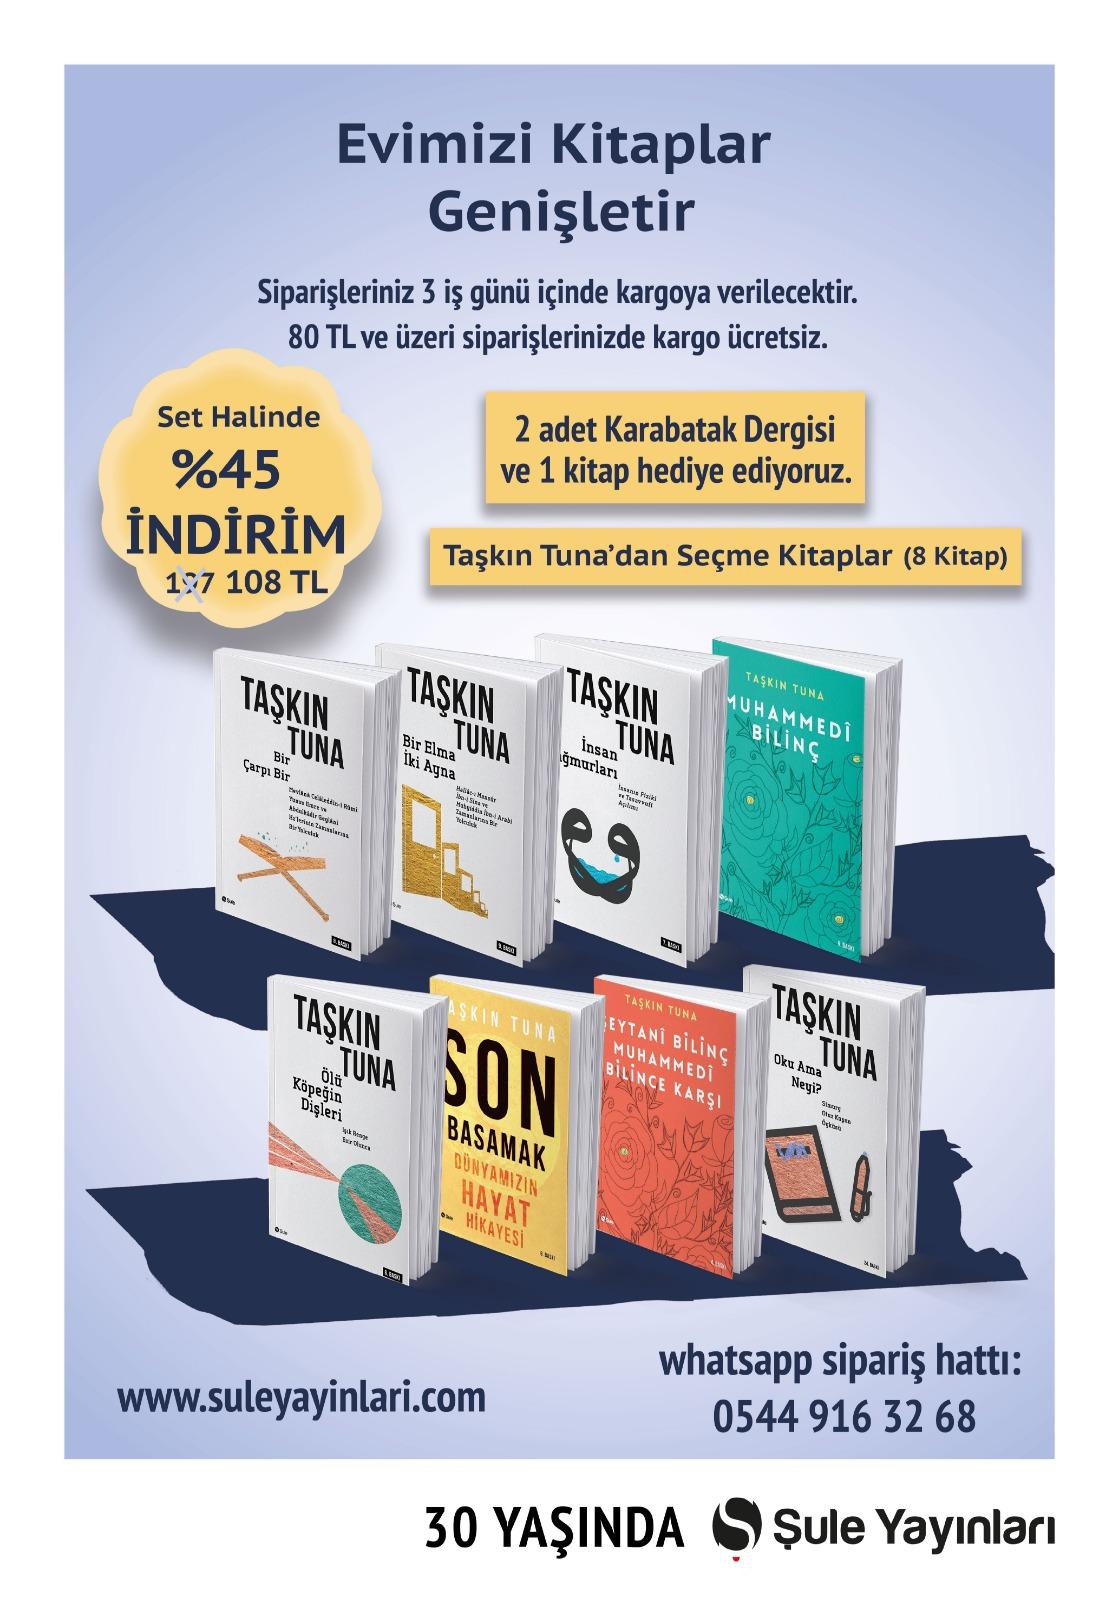 Taşkın Tuna Seçme Kitaplar (8 Kitap)